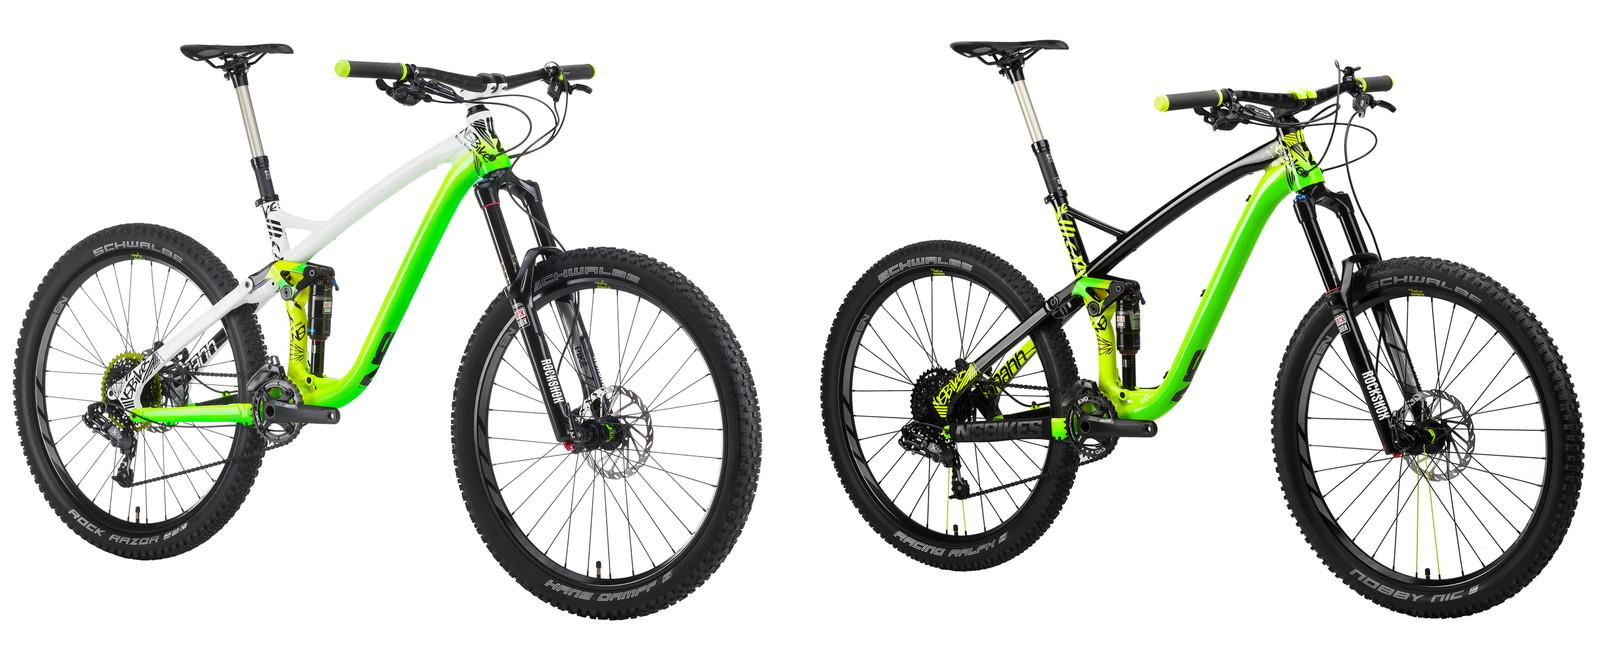 First Look 2015 Ns Snabb Enduro And Trail Bikes Mountain Bikes